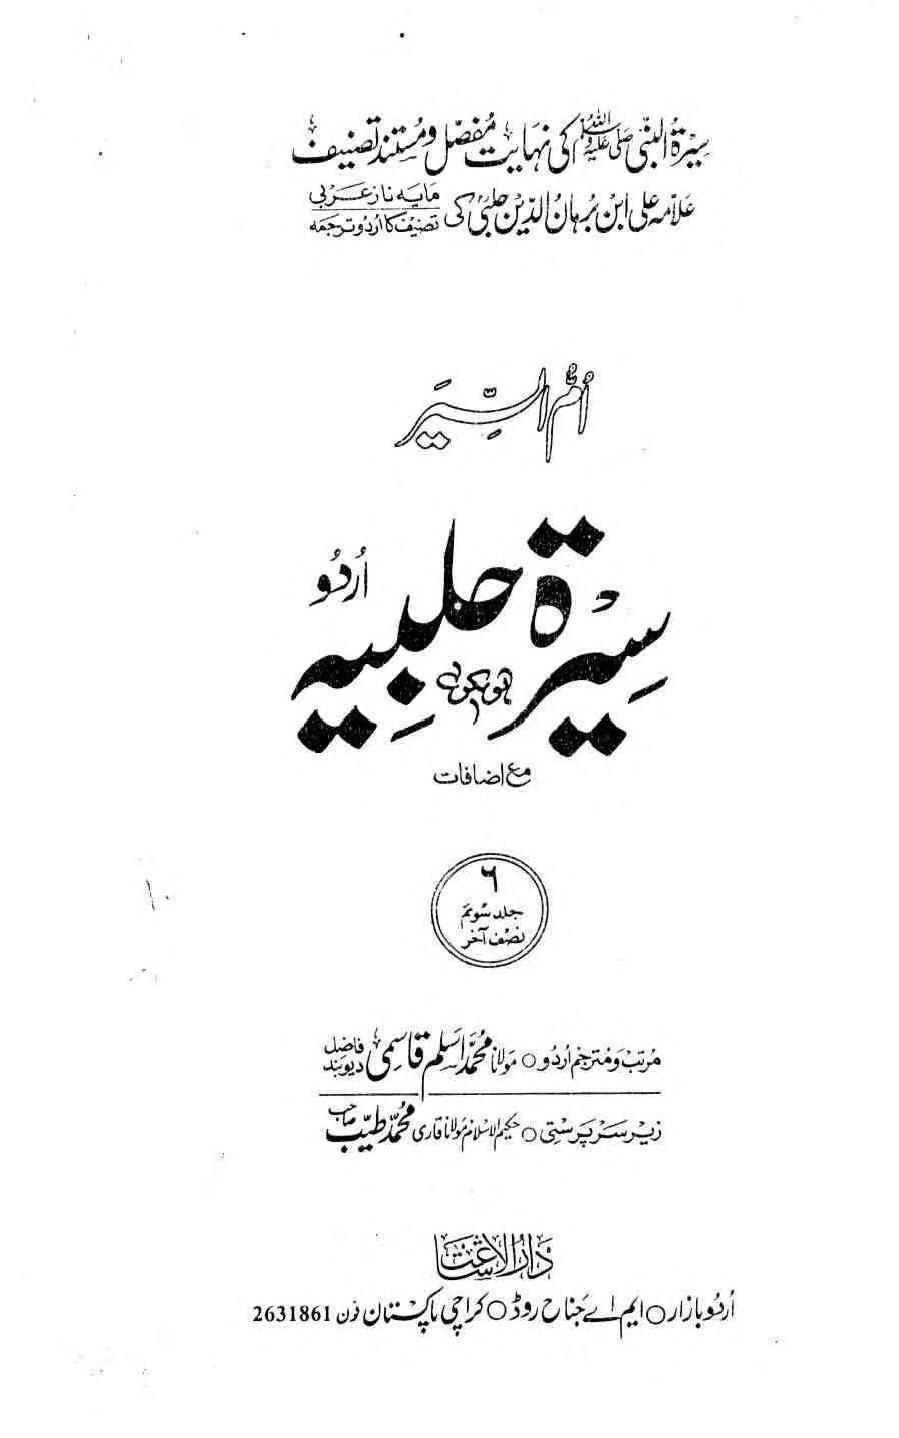 Seerat-e-Halbiya-Volume6-UrduTranslationByShaykhMuhammadAslamQasmi_0000.jpg